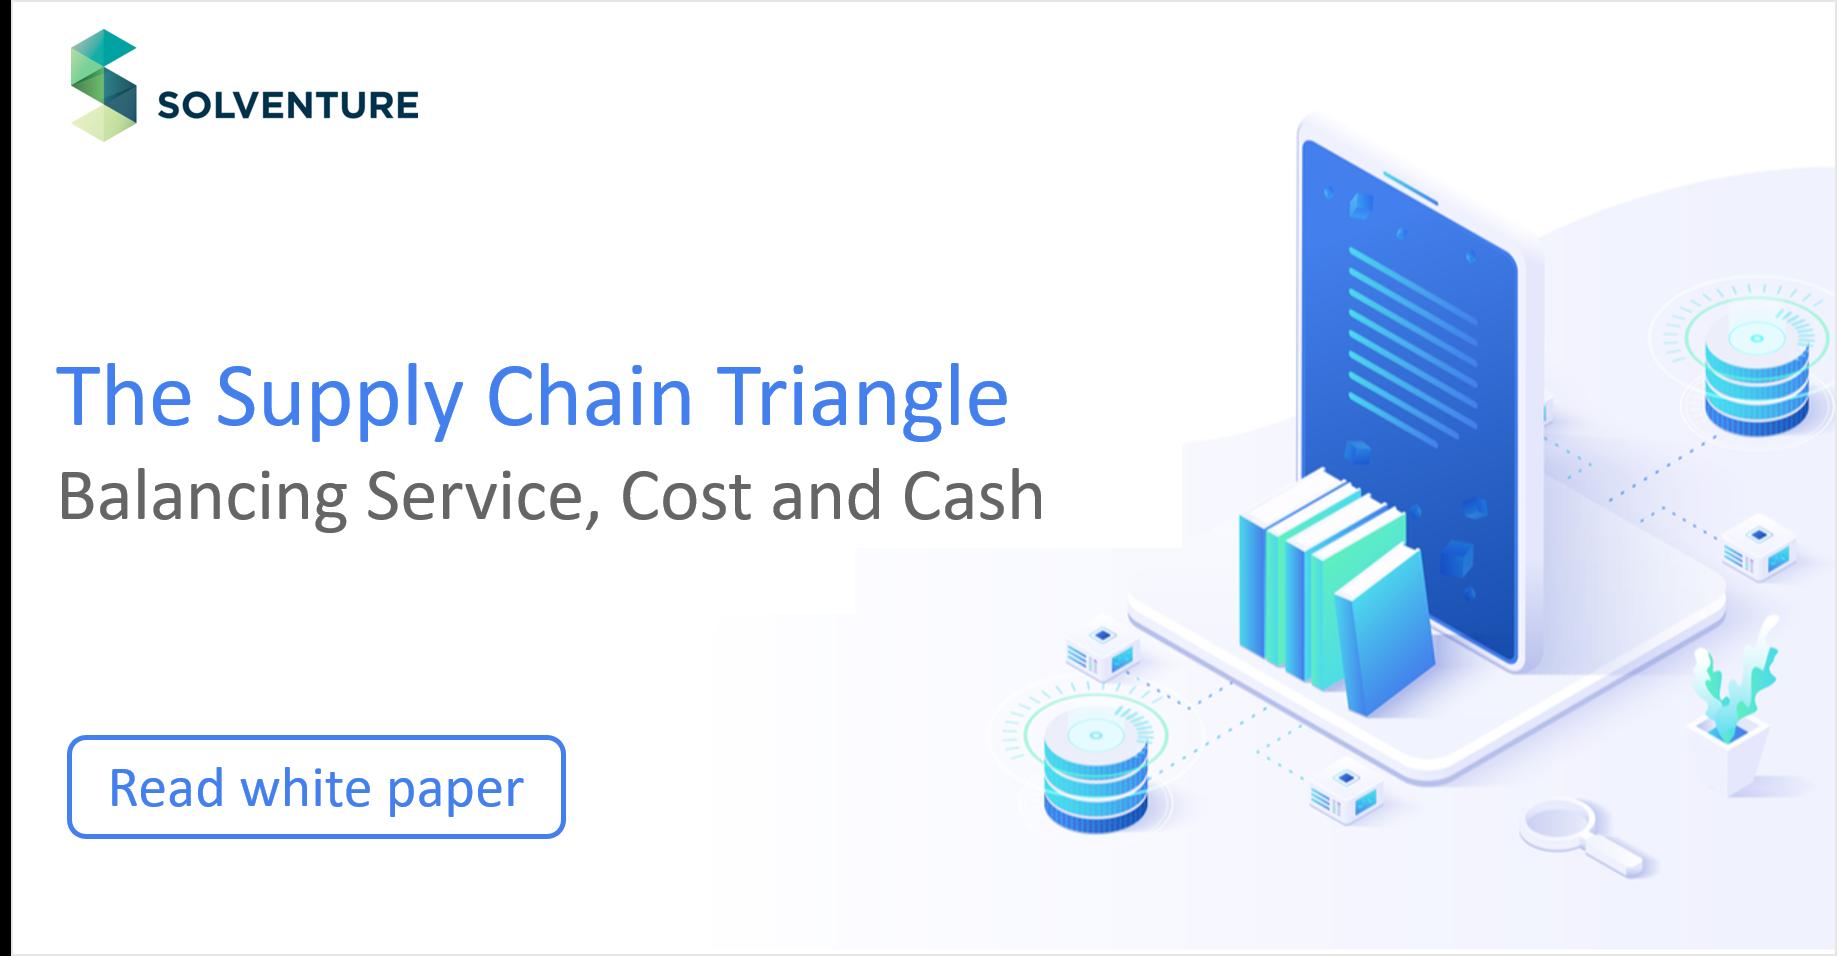 Supply Chain Triangle white paper